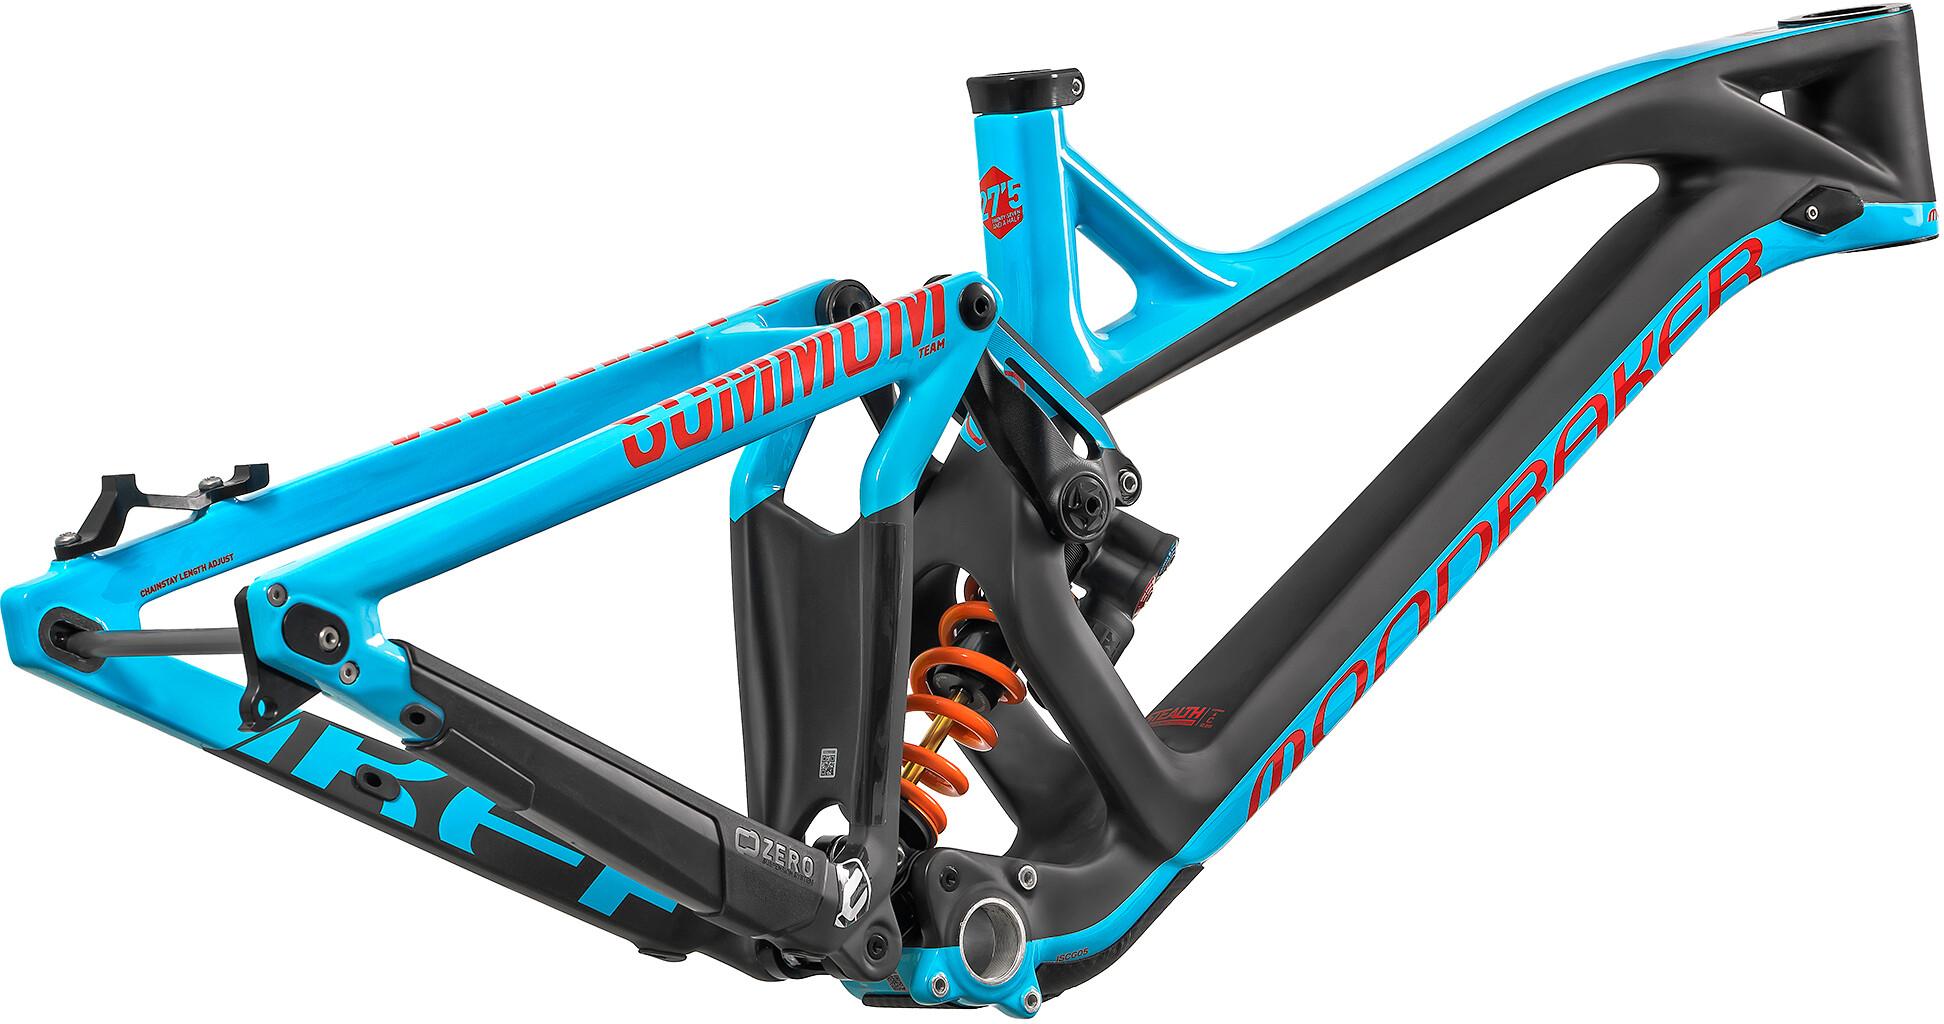 Mondraker Summum Carbon Pro Team Stel, light blue/flame red/carbon (2019) | Frames